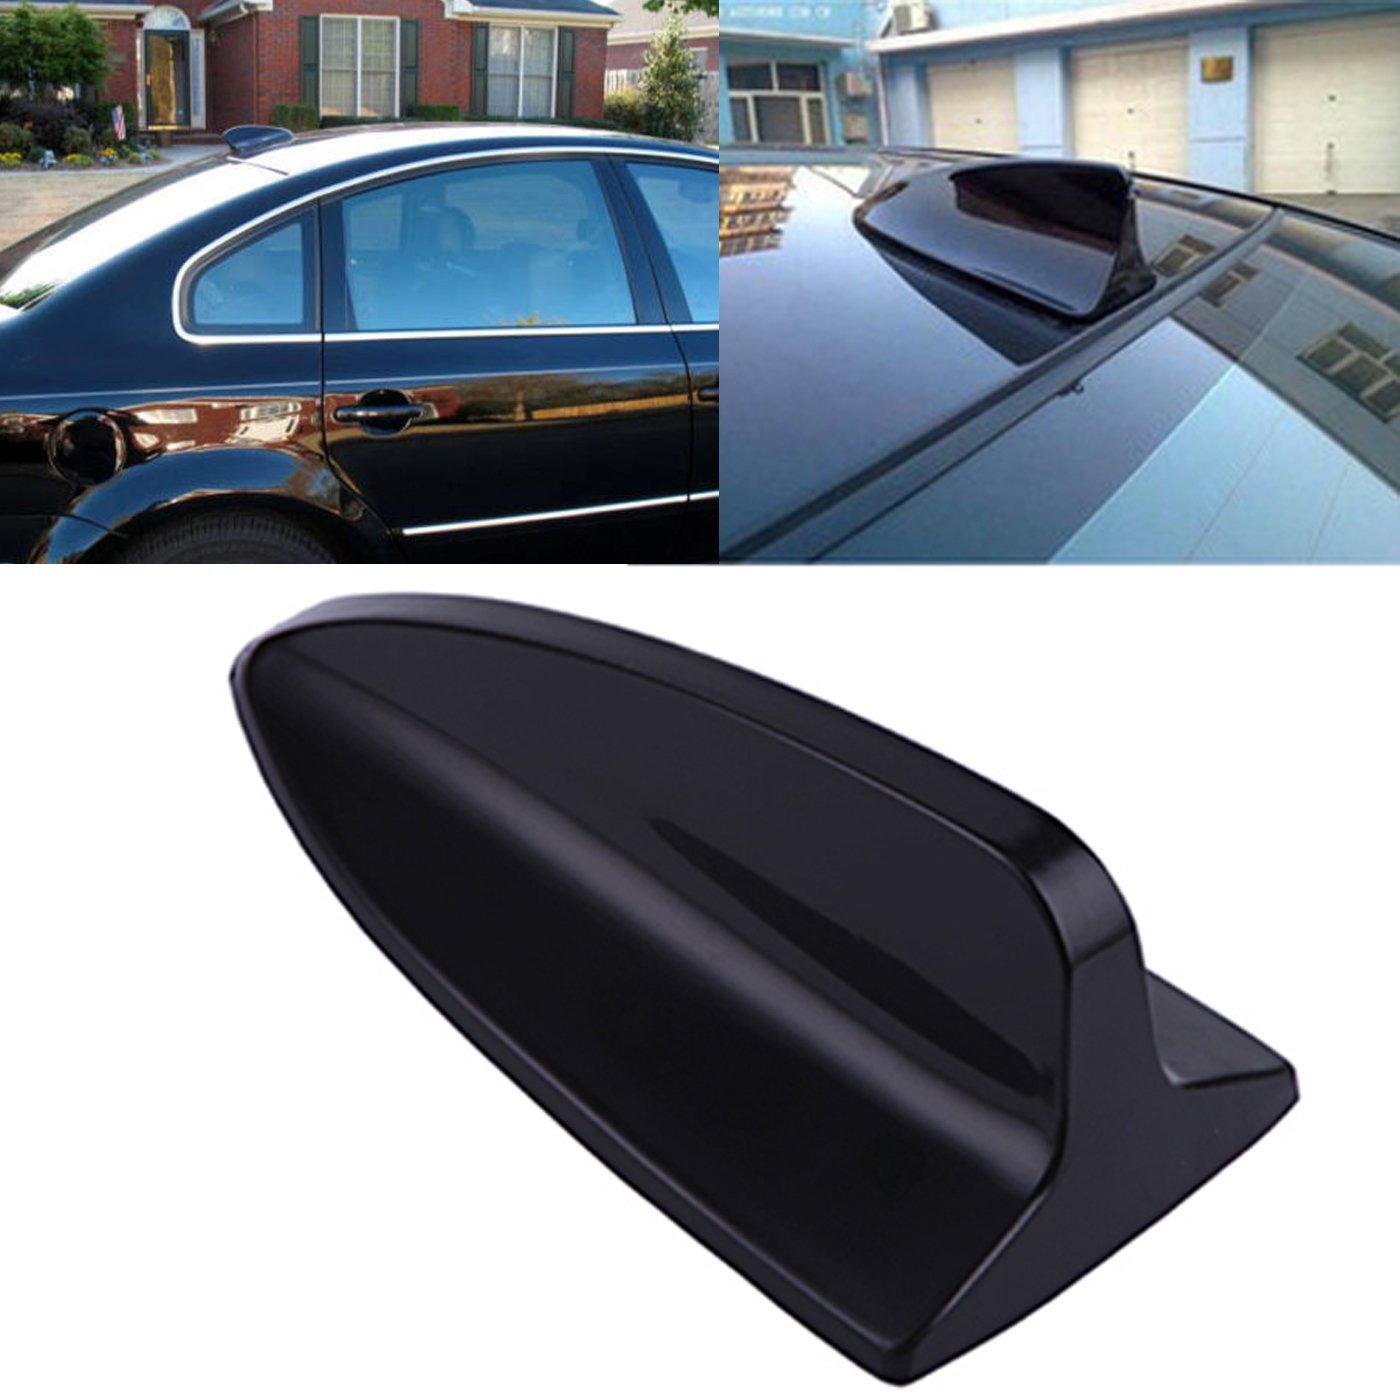 HDE Universal Decorative Shark Fin Car Antenna - Black HDE-P84